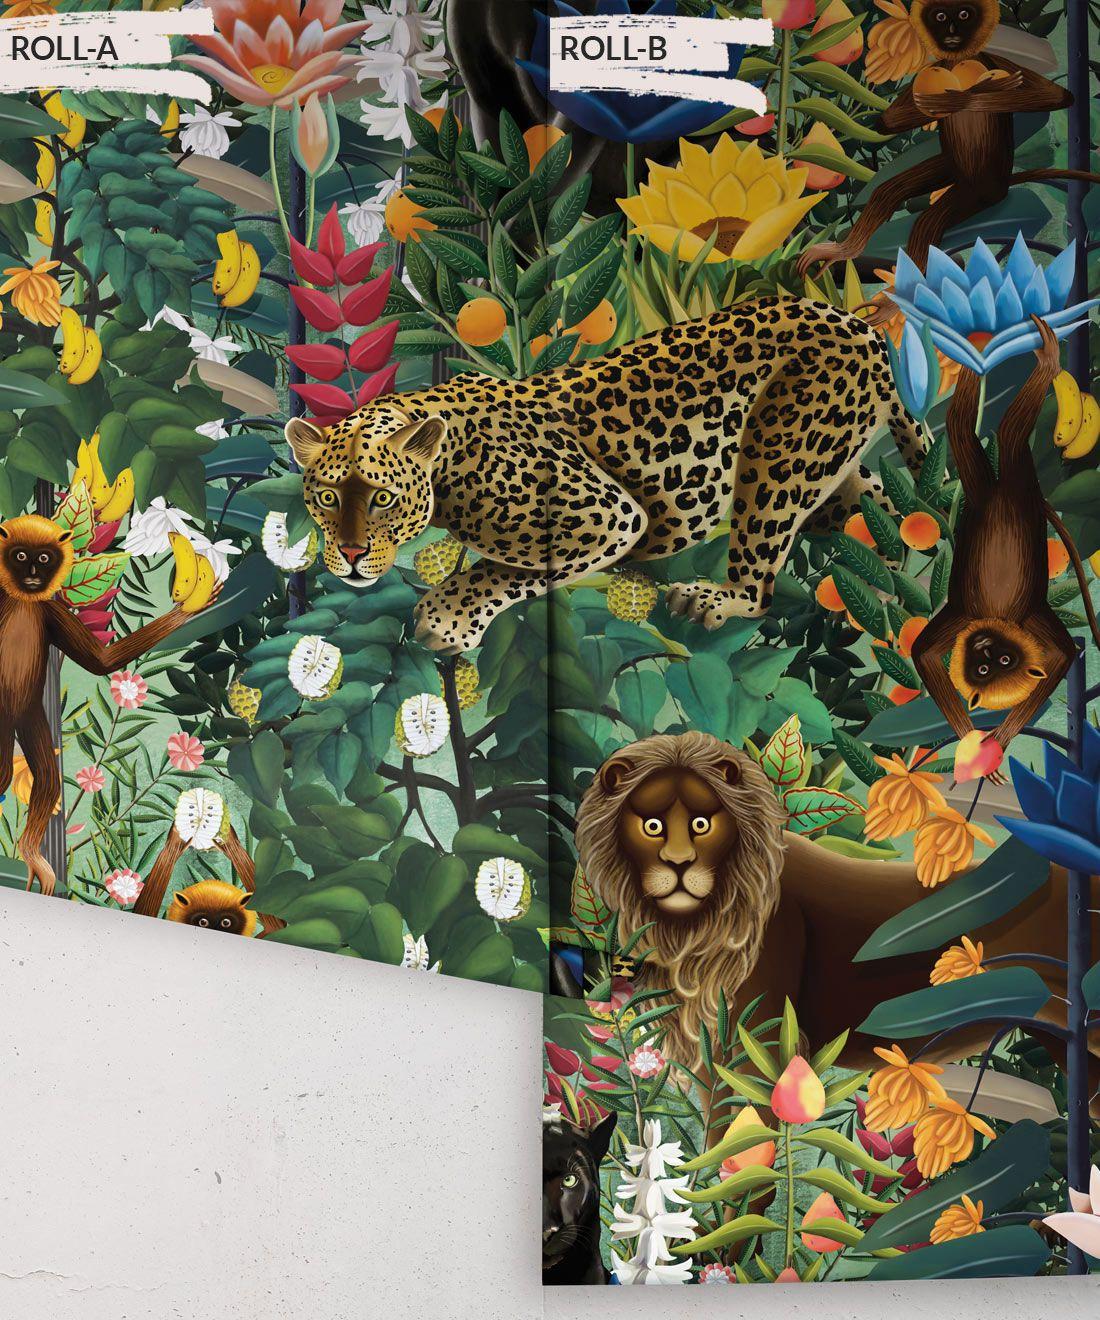 The Jungle Wallpaper • Animal Wallpaper • Botanical Wallpaper • Greenery Wallpaper • Rolls